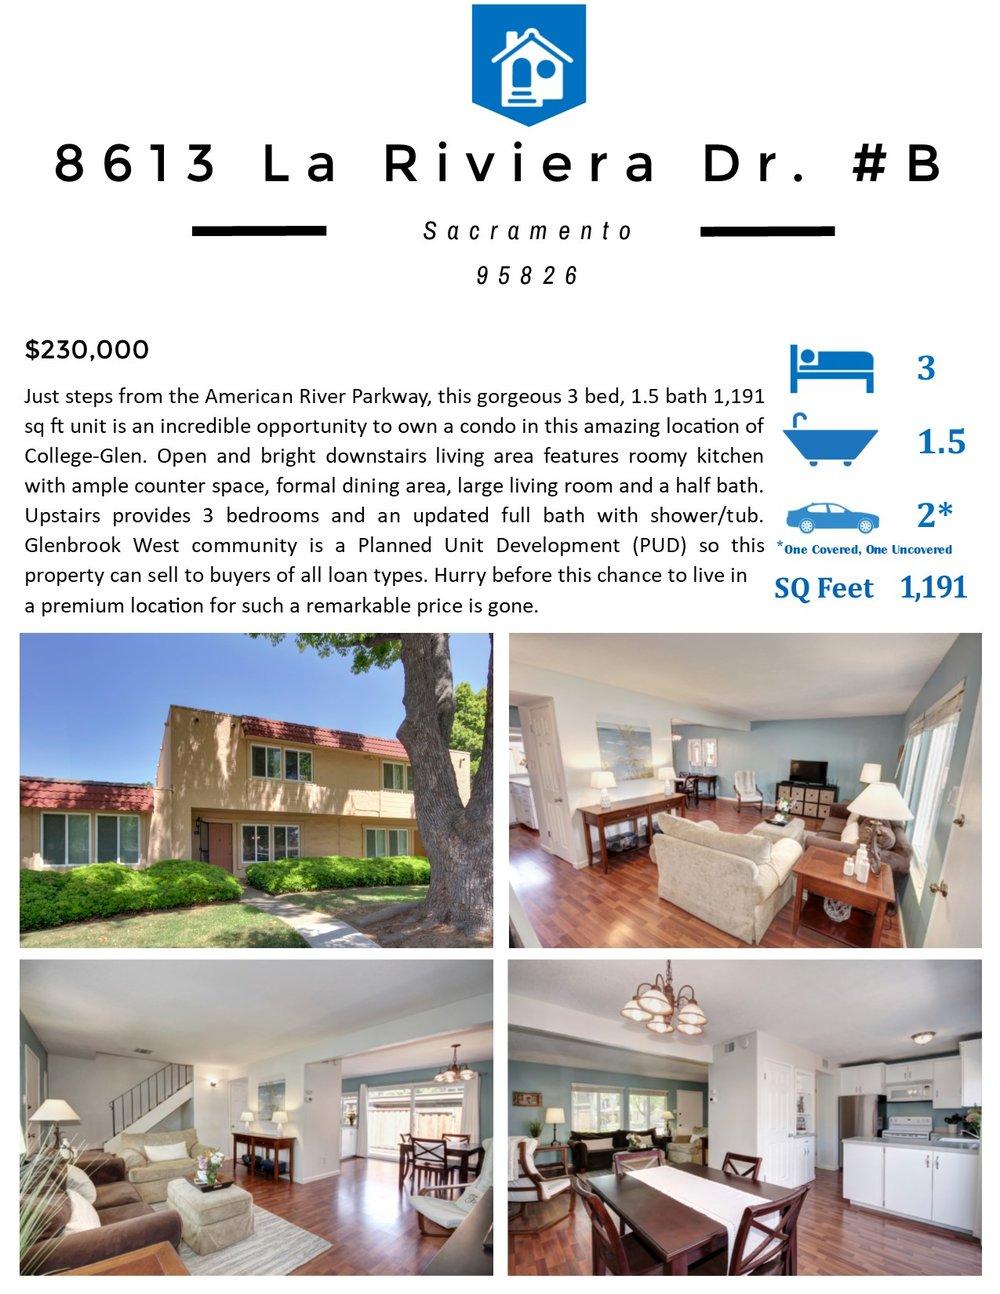 Flyer Front - 8613 La Riviera Dr #B, Sacramento, CA 95843.jpg